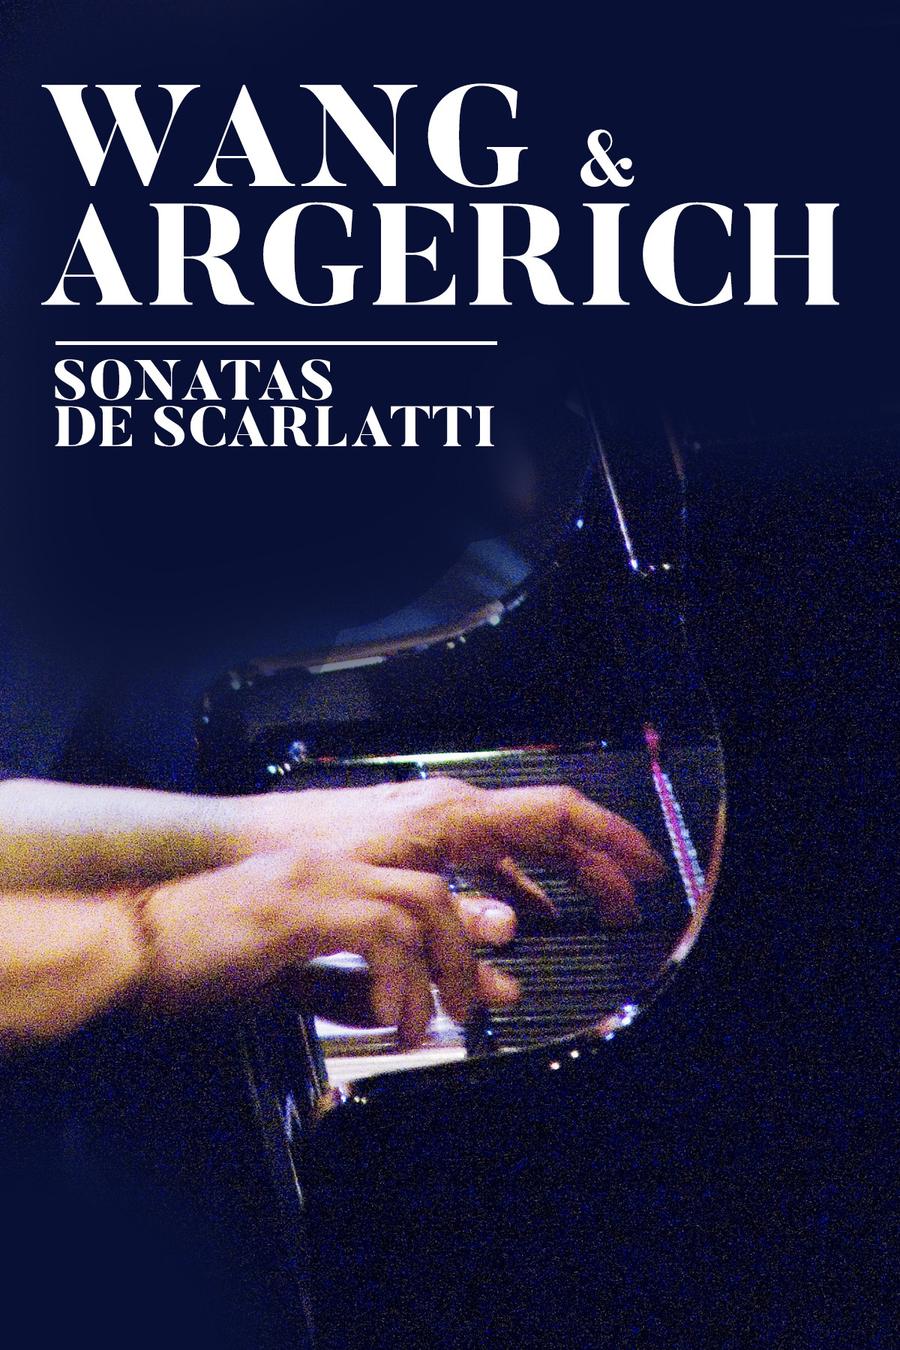 Sonates de Scarlatti